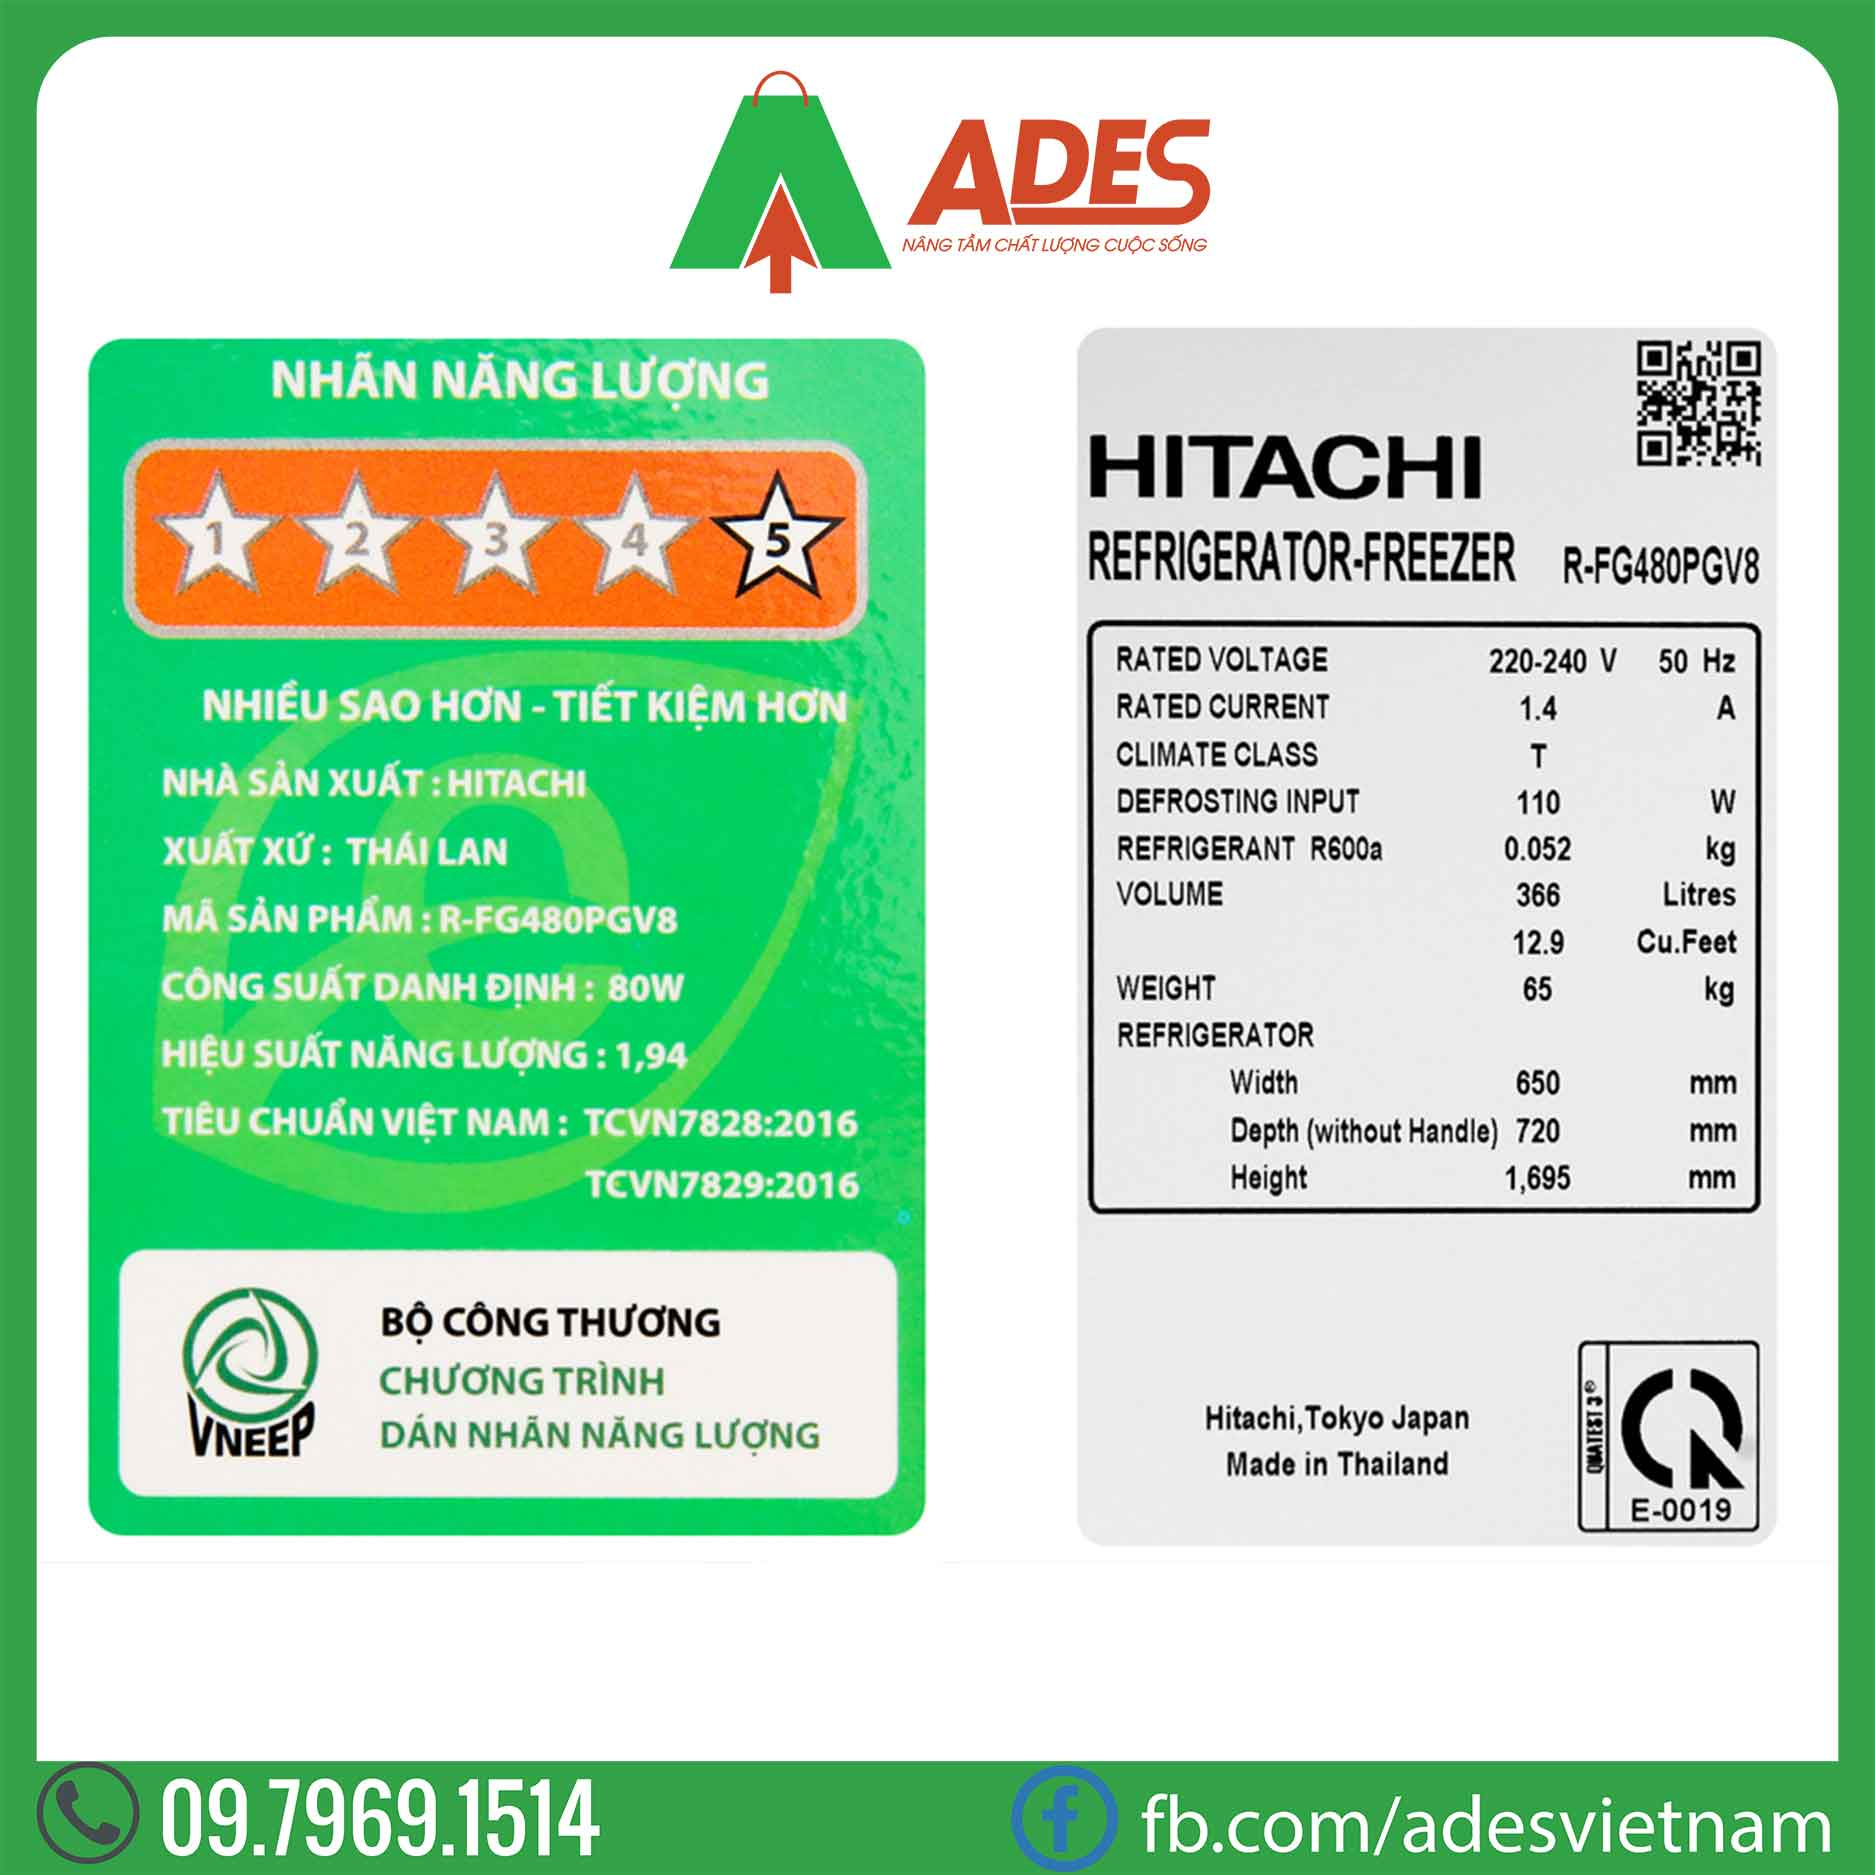 Tu lanh Hitachi Inverter R-FG480PGV8 GBW